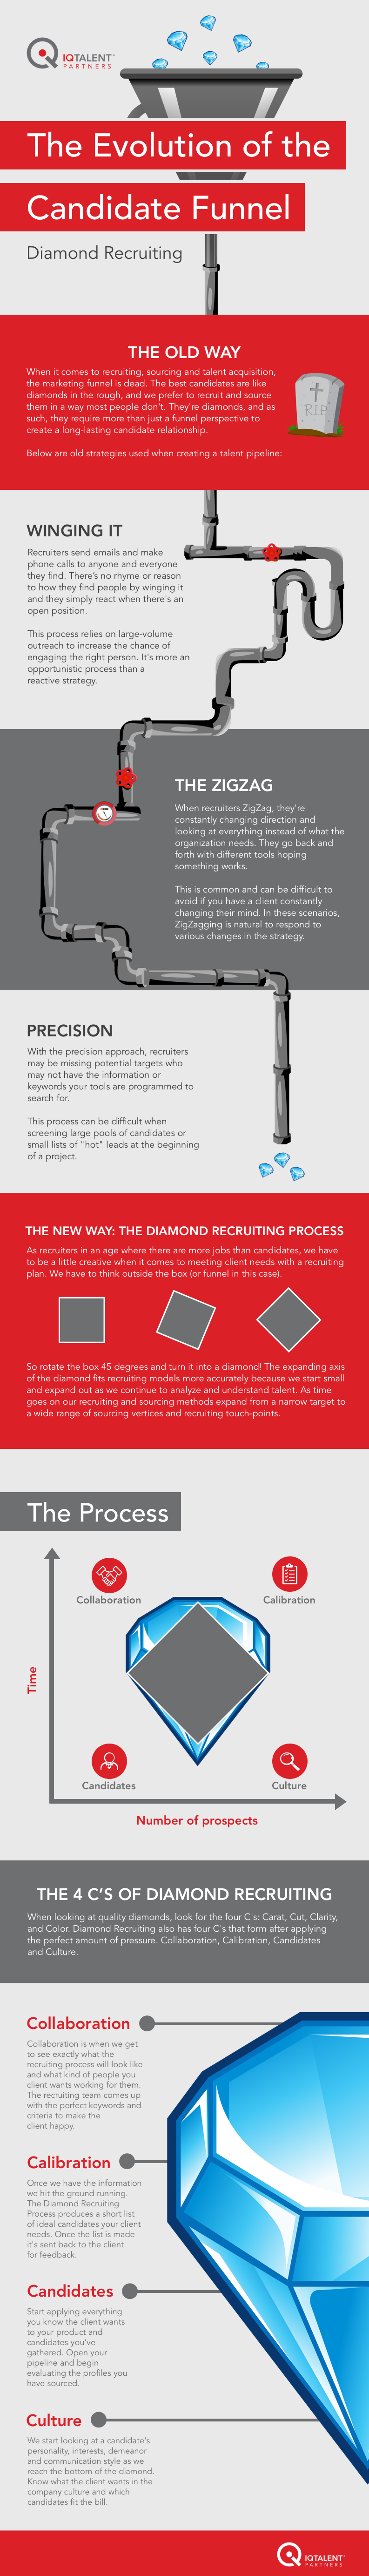 IQTP Diamond Recruiting Infographic